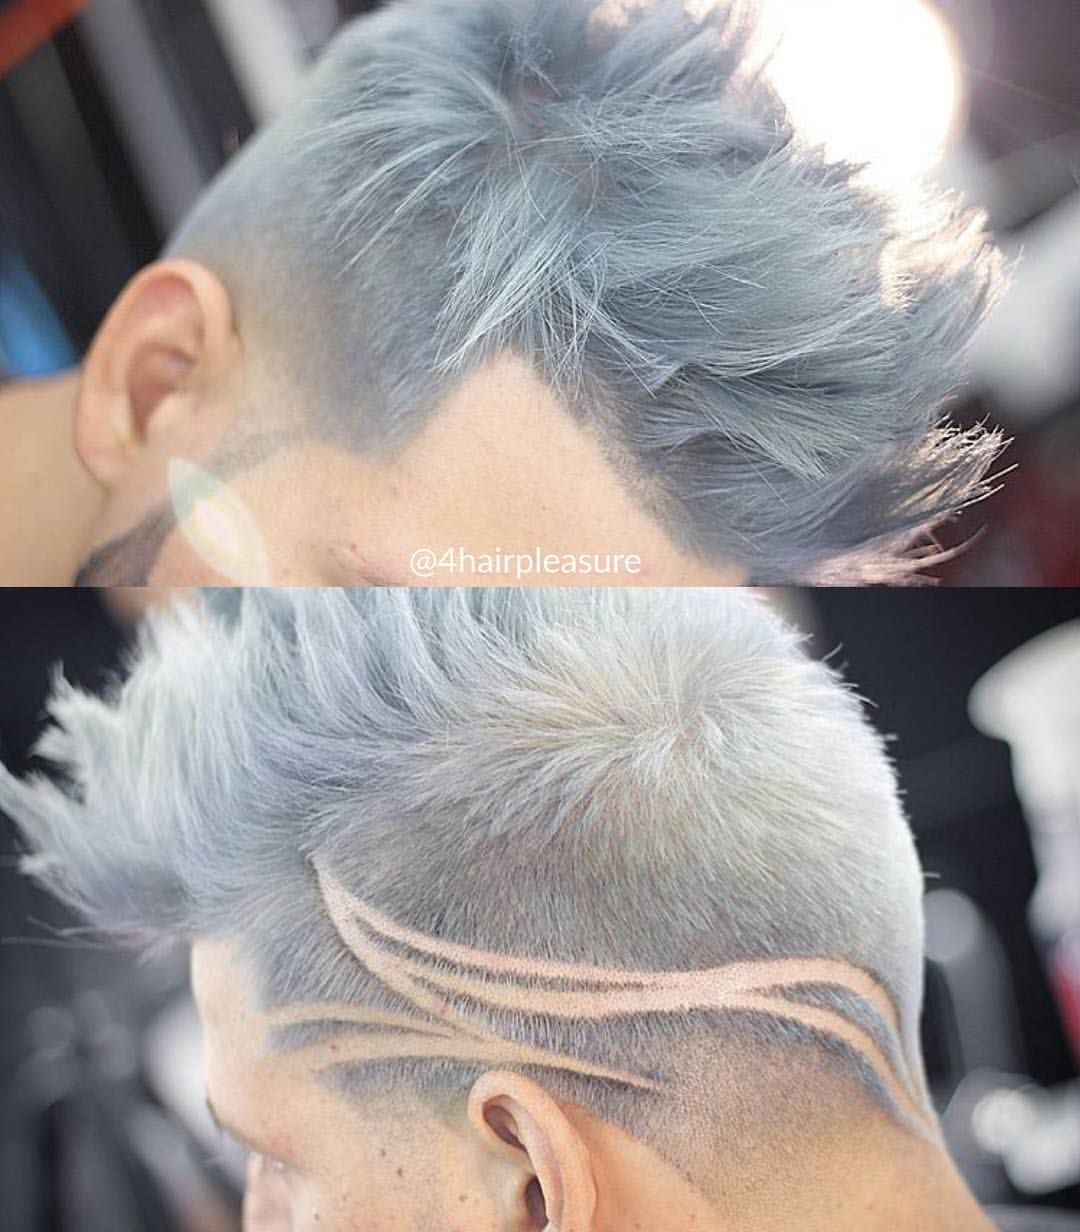 Haircut for men near me consulta esta foto de instagram de menshairg u  me gusta